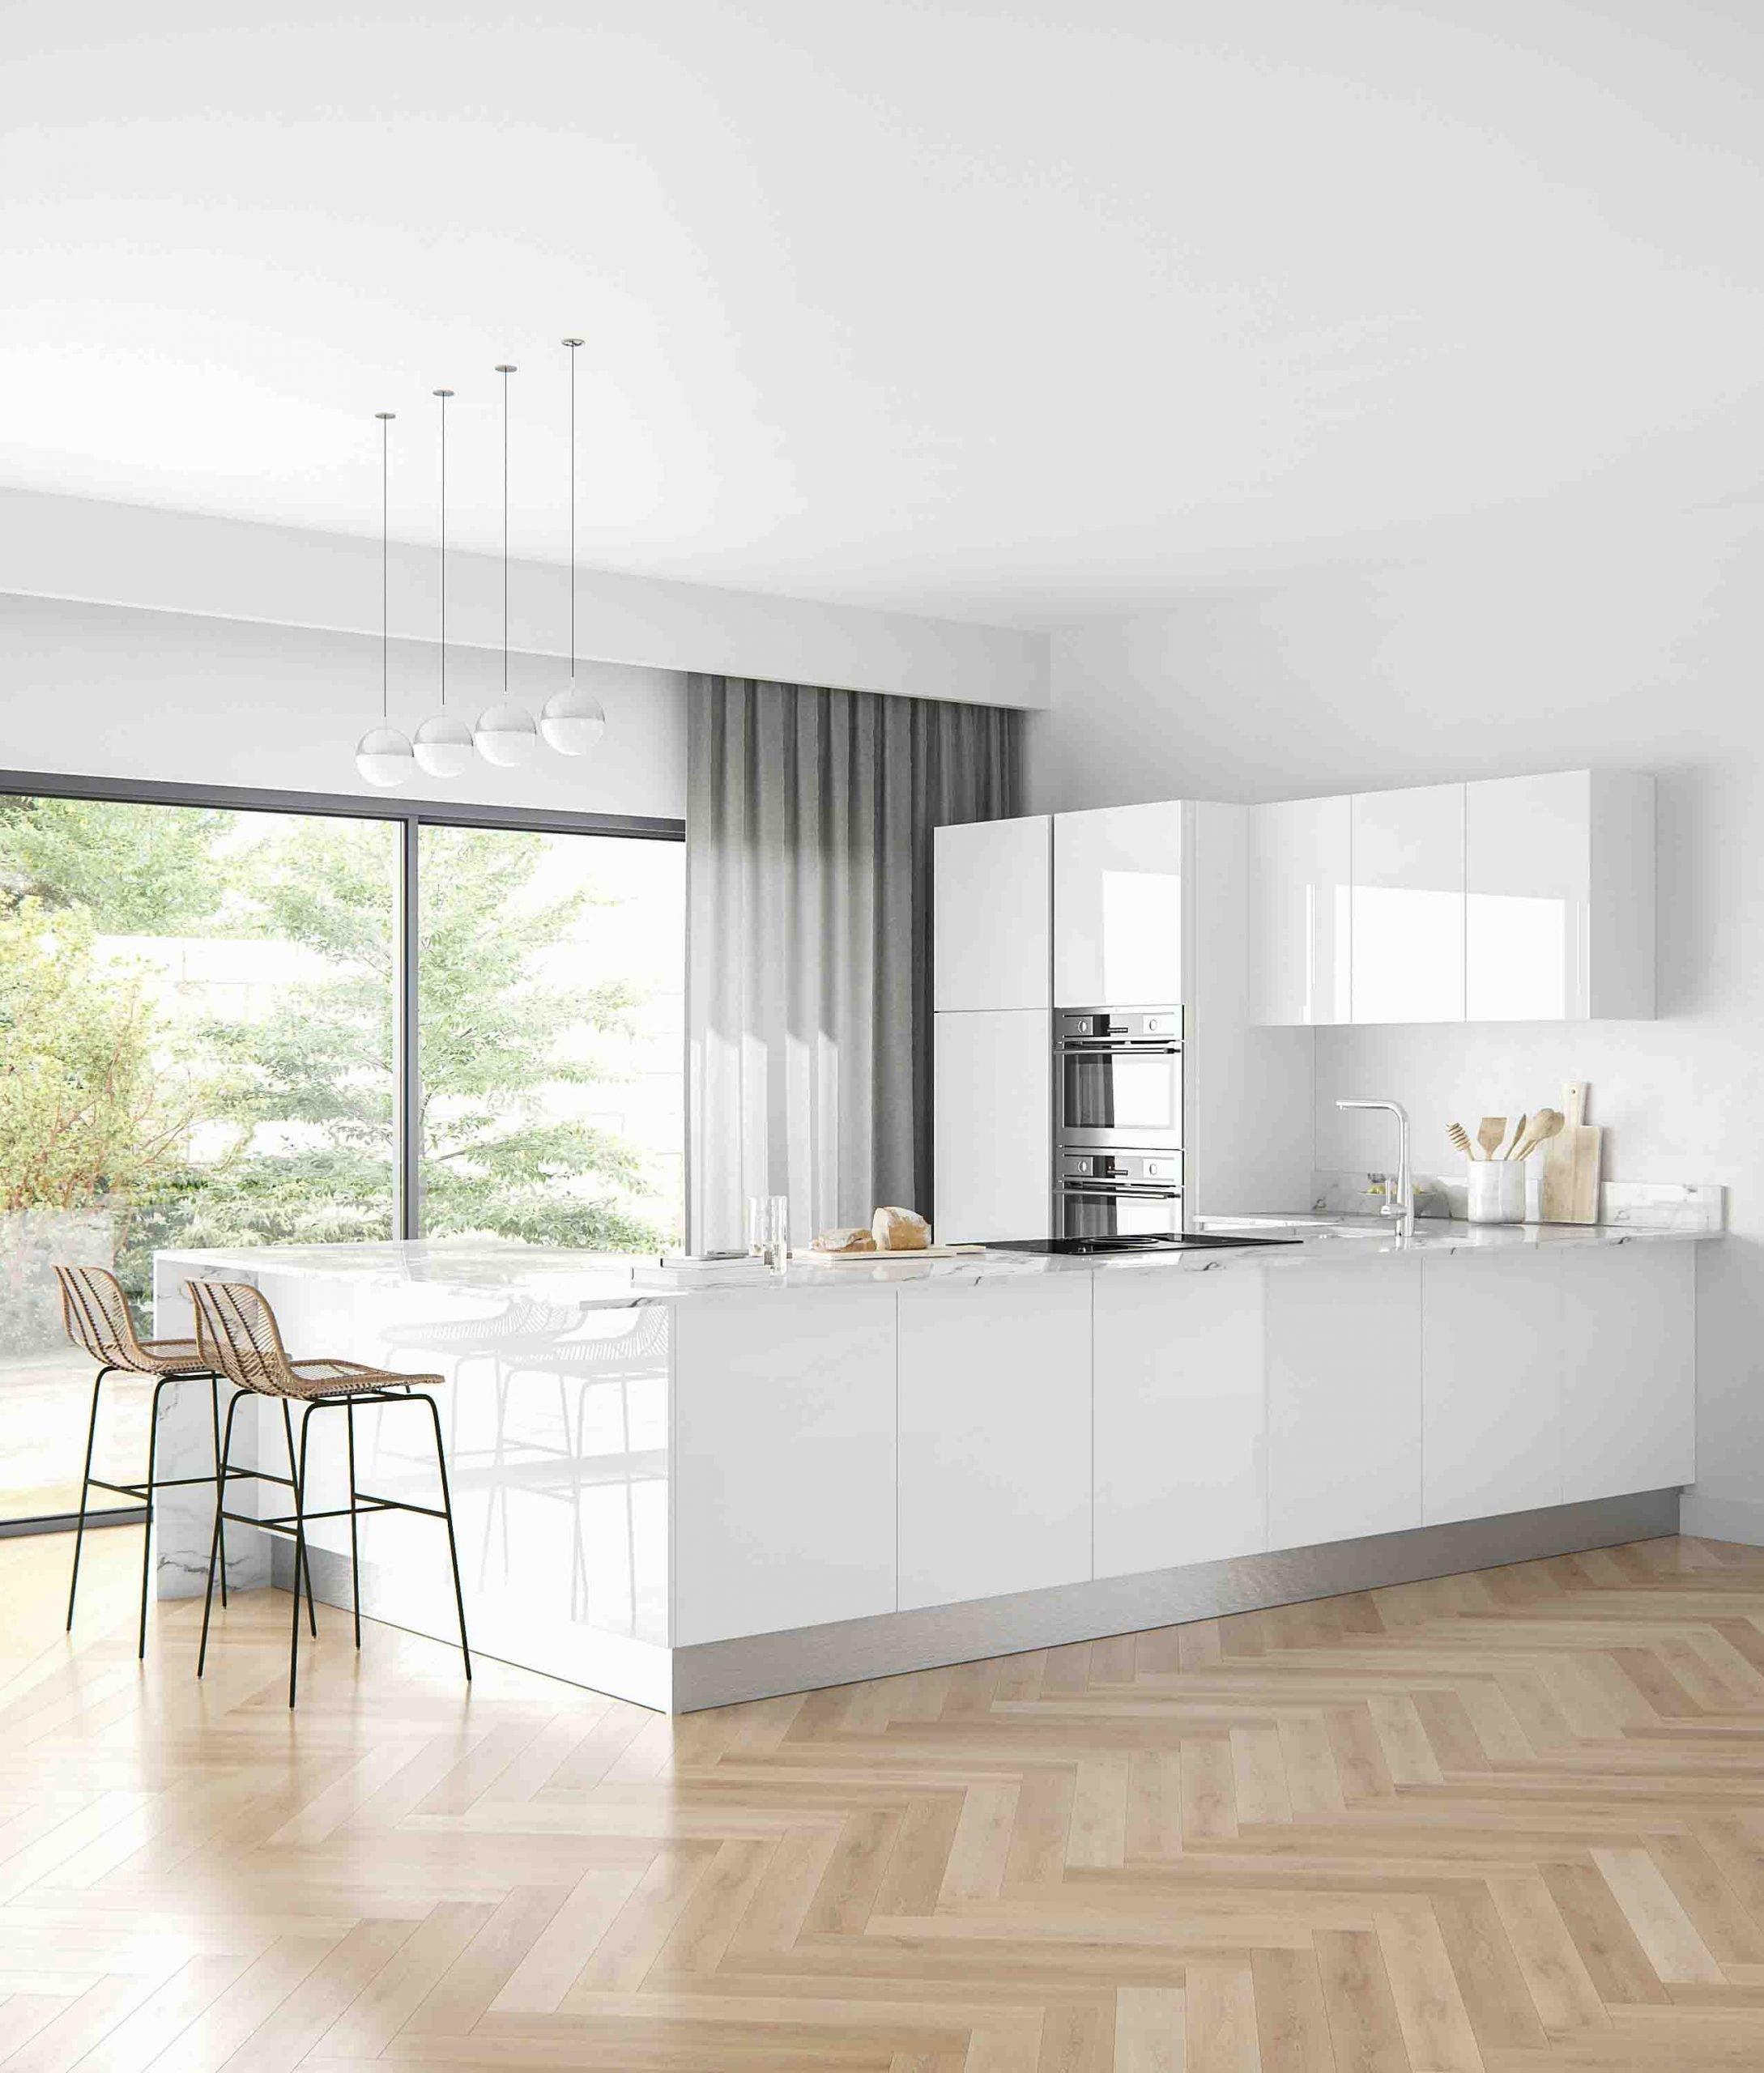 https://dprostudio.com/wp-content/uploads/2021/01/GRIXTI01_kitchen_blanche_hq_cam1-scaled.jpg